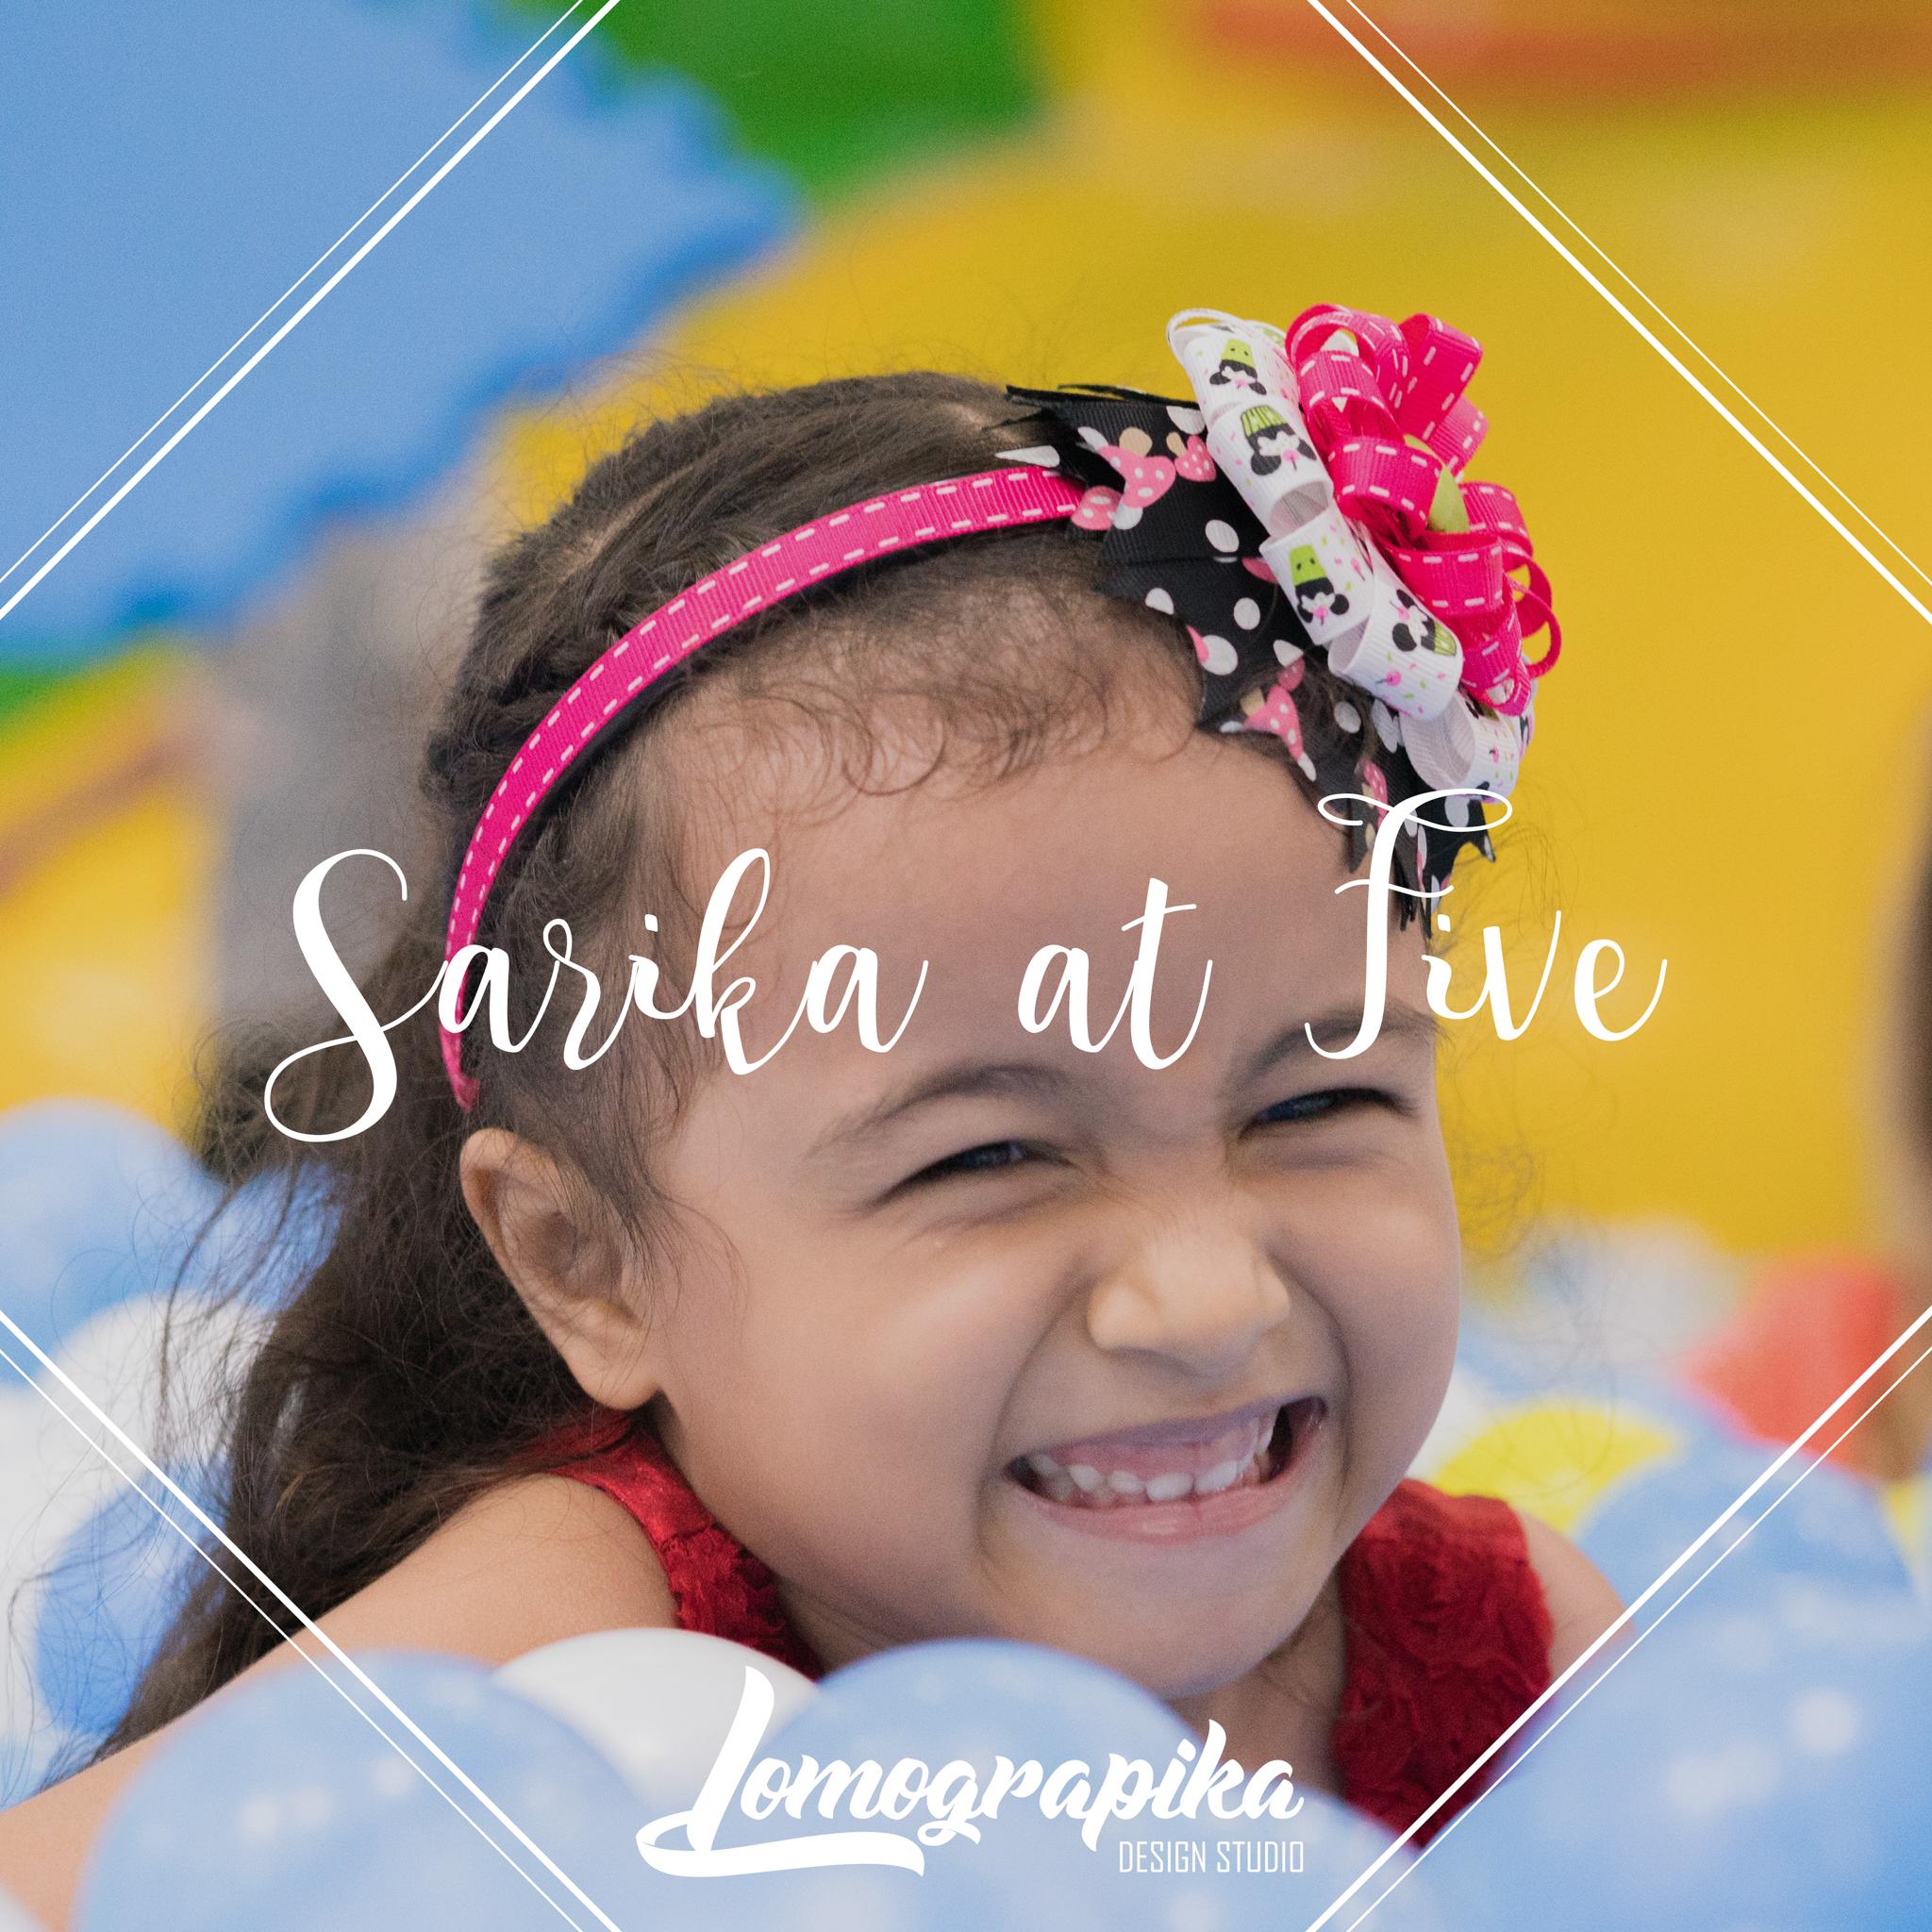 Photo by: Lomograpika Design Studio #Lomograpika